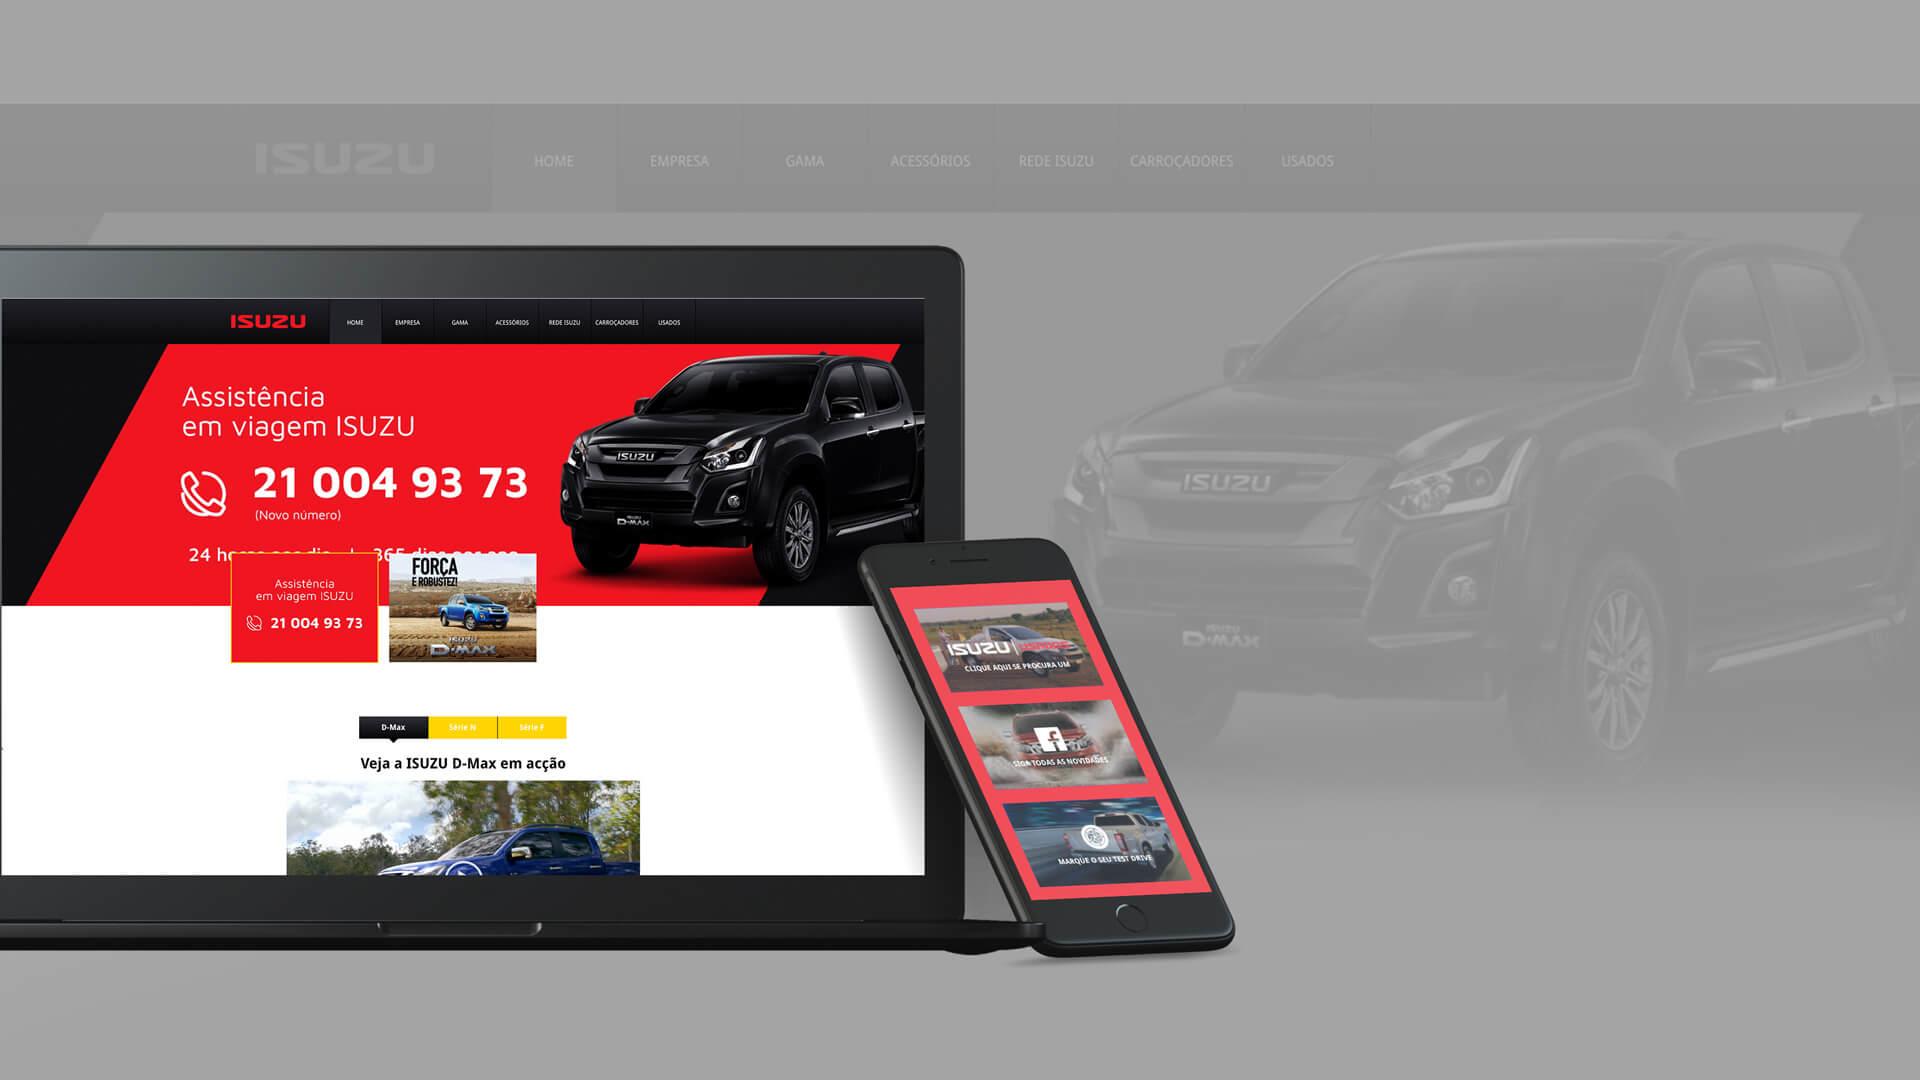 load mobile and web mockup of isuzu case study